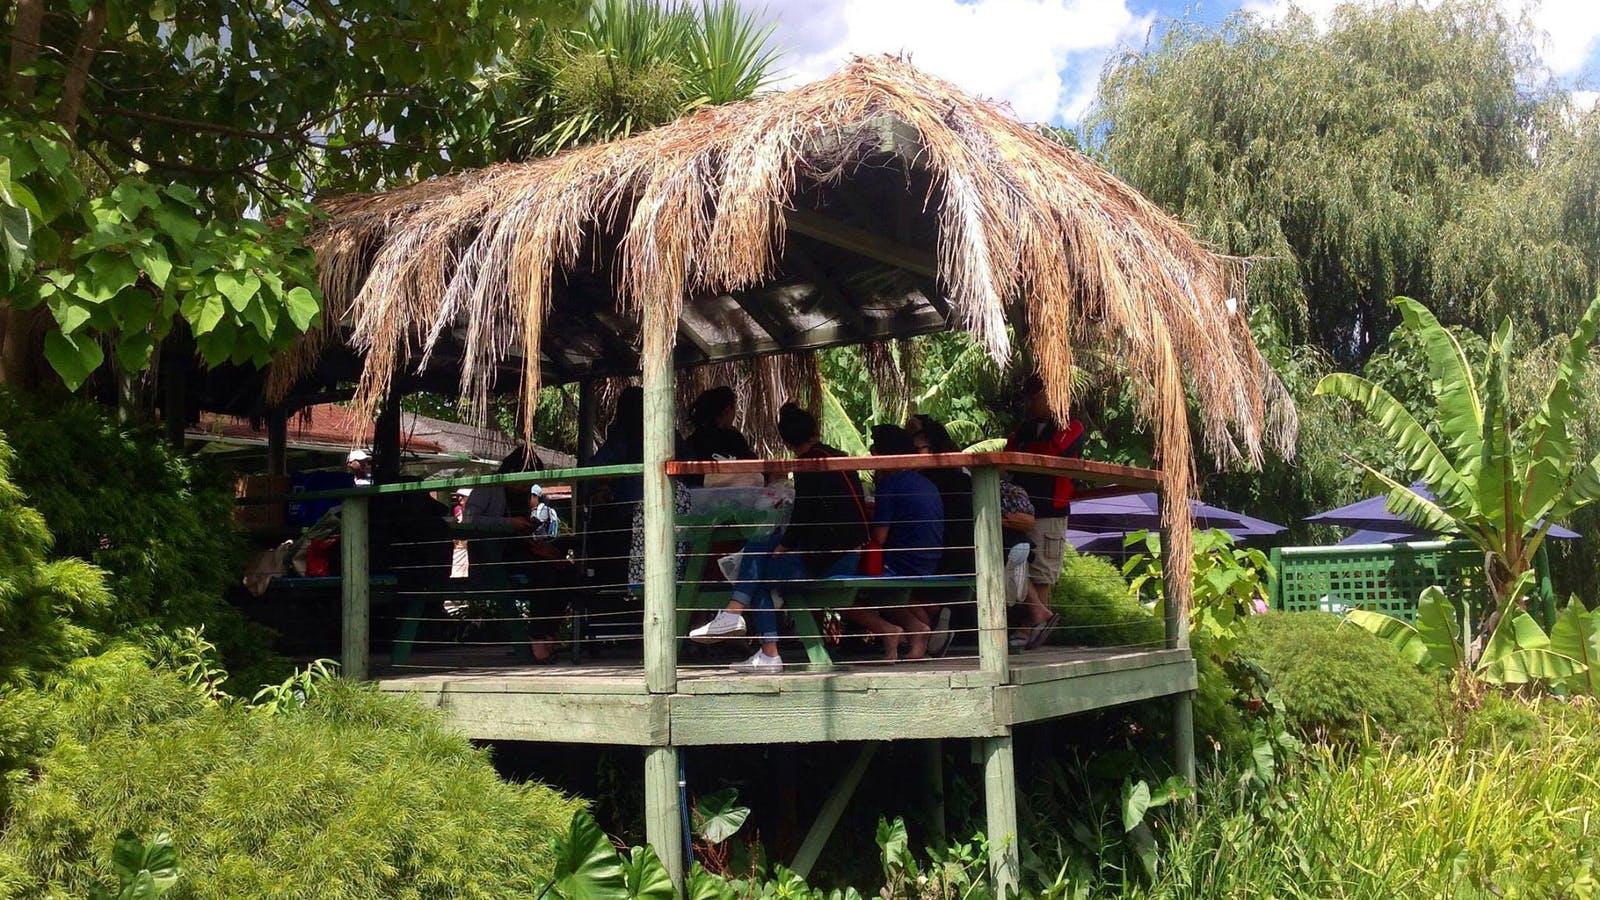 Family picnic and barbecue hut, Peter Cochrane